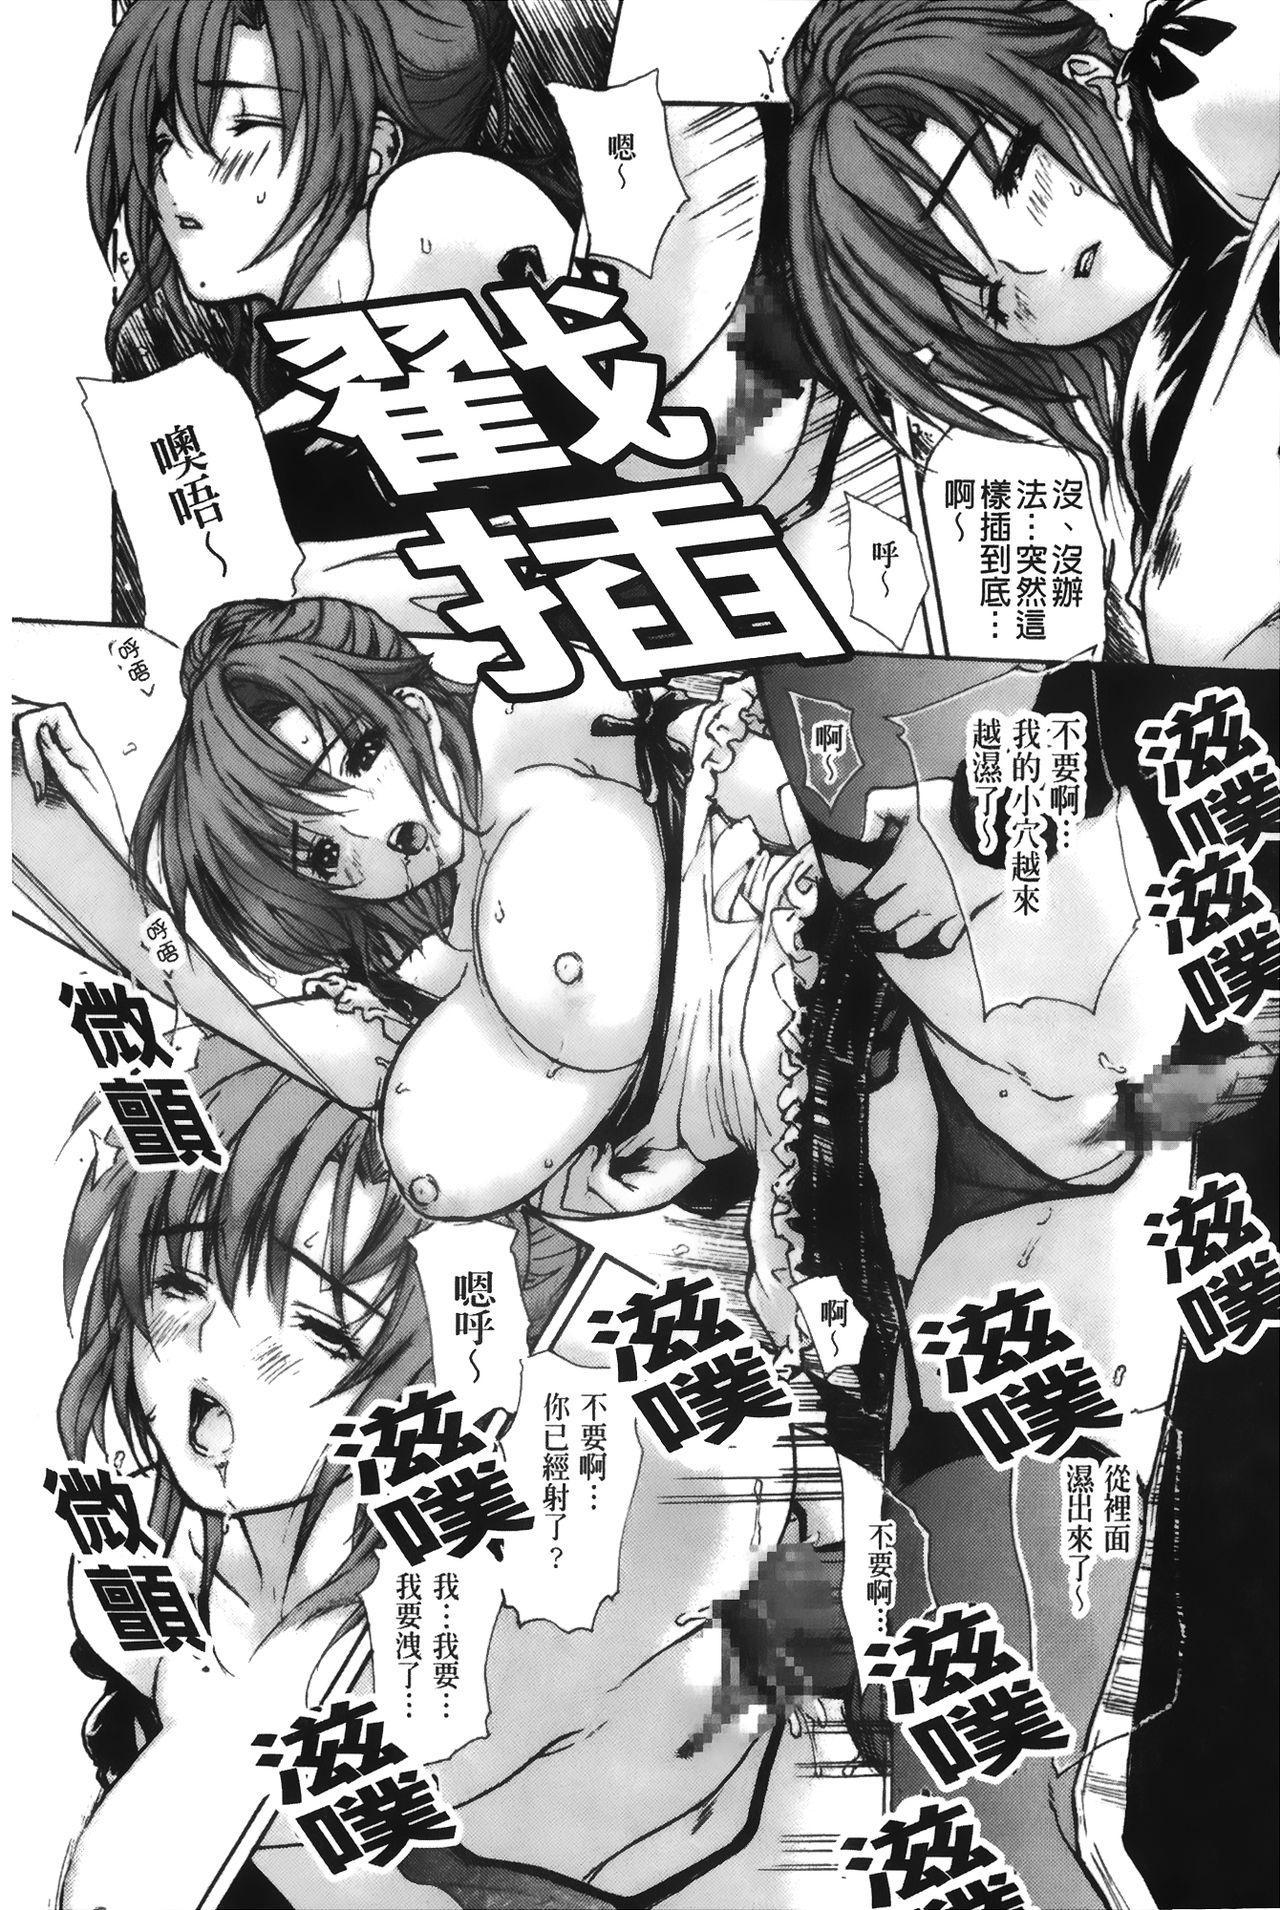 Tonari no Minano Sensei 4 | 隔壁的美奈乃老師 4 213